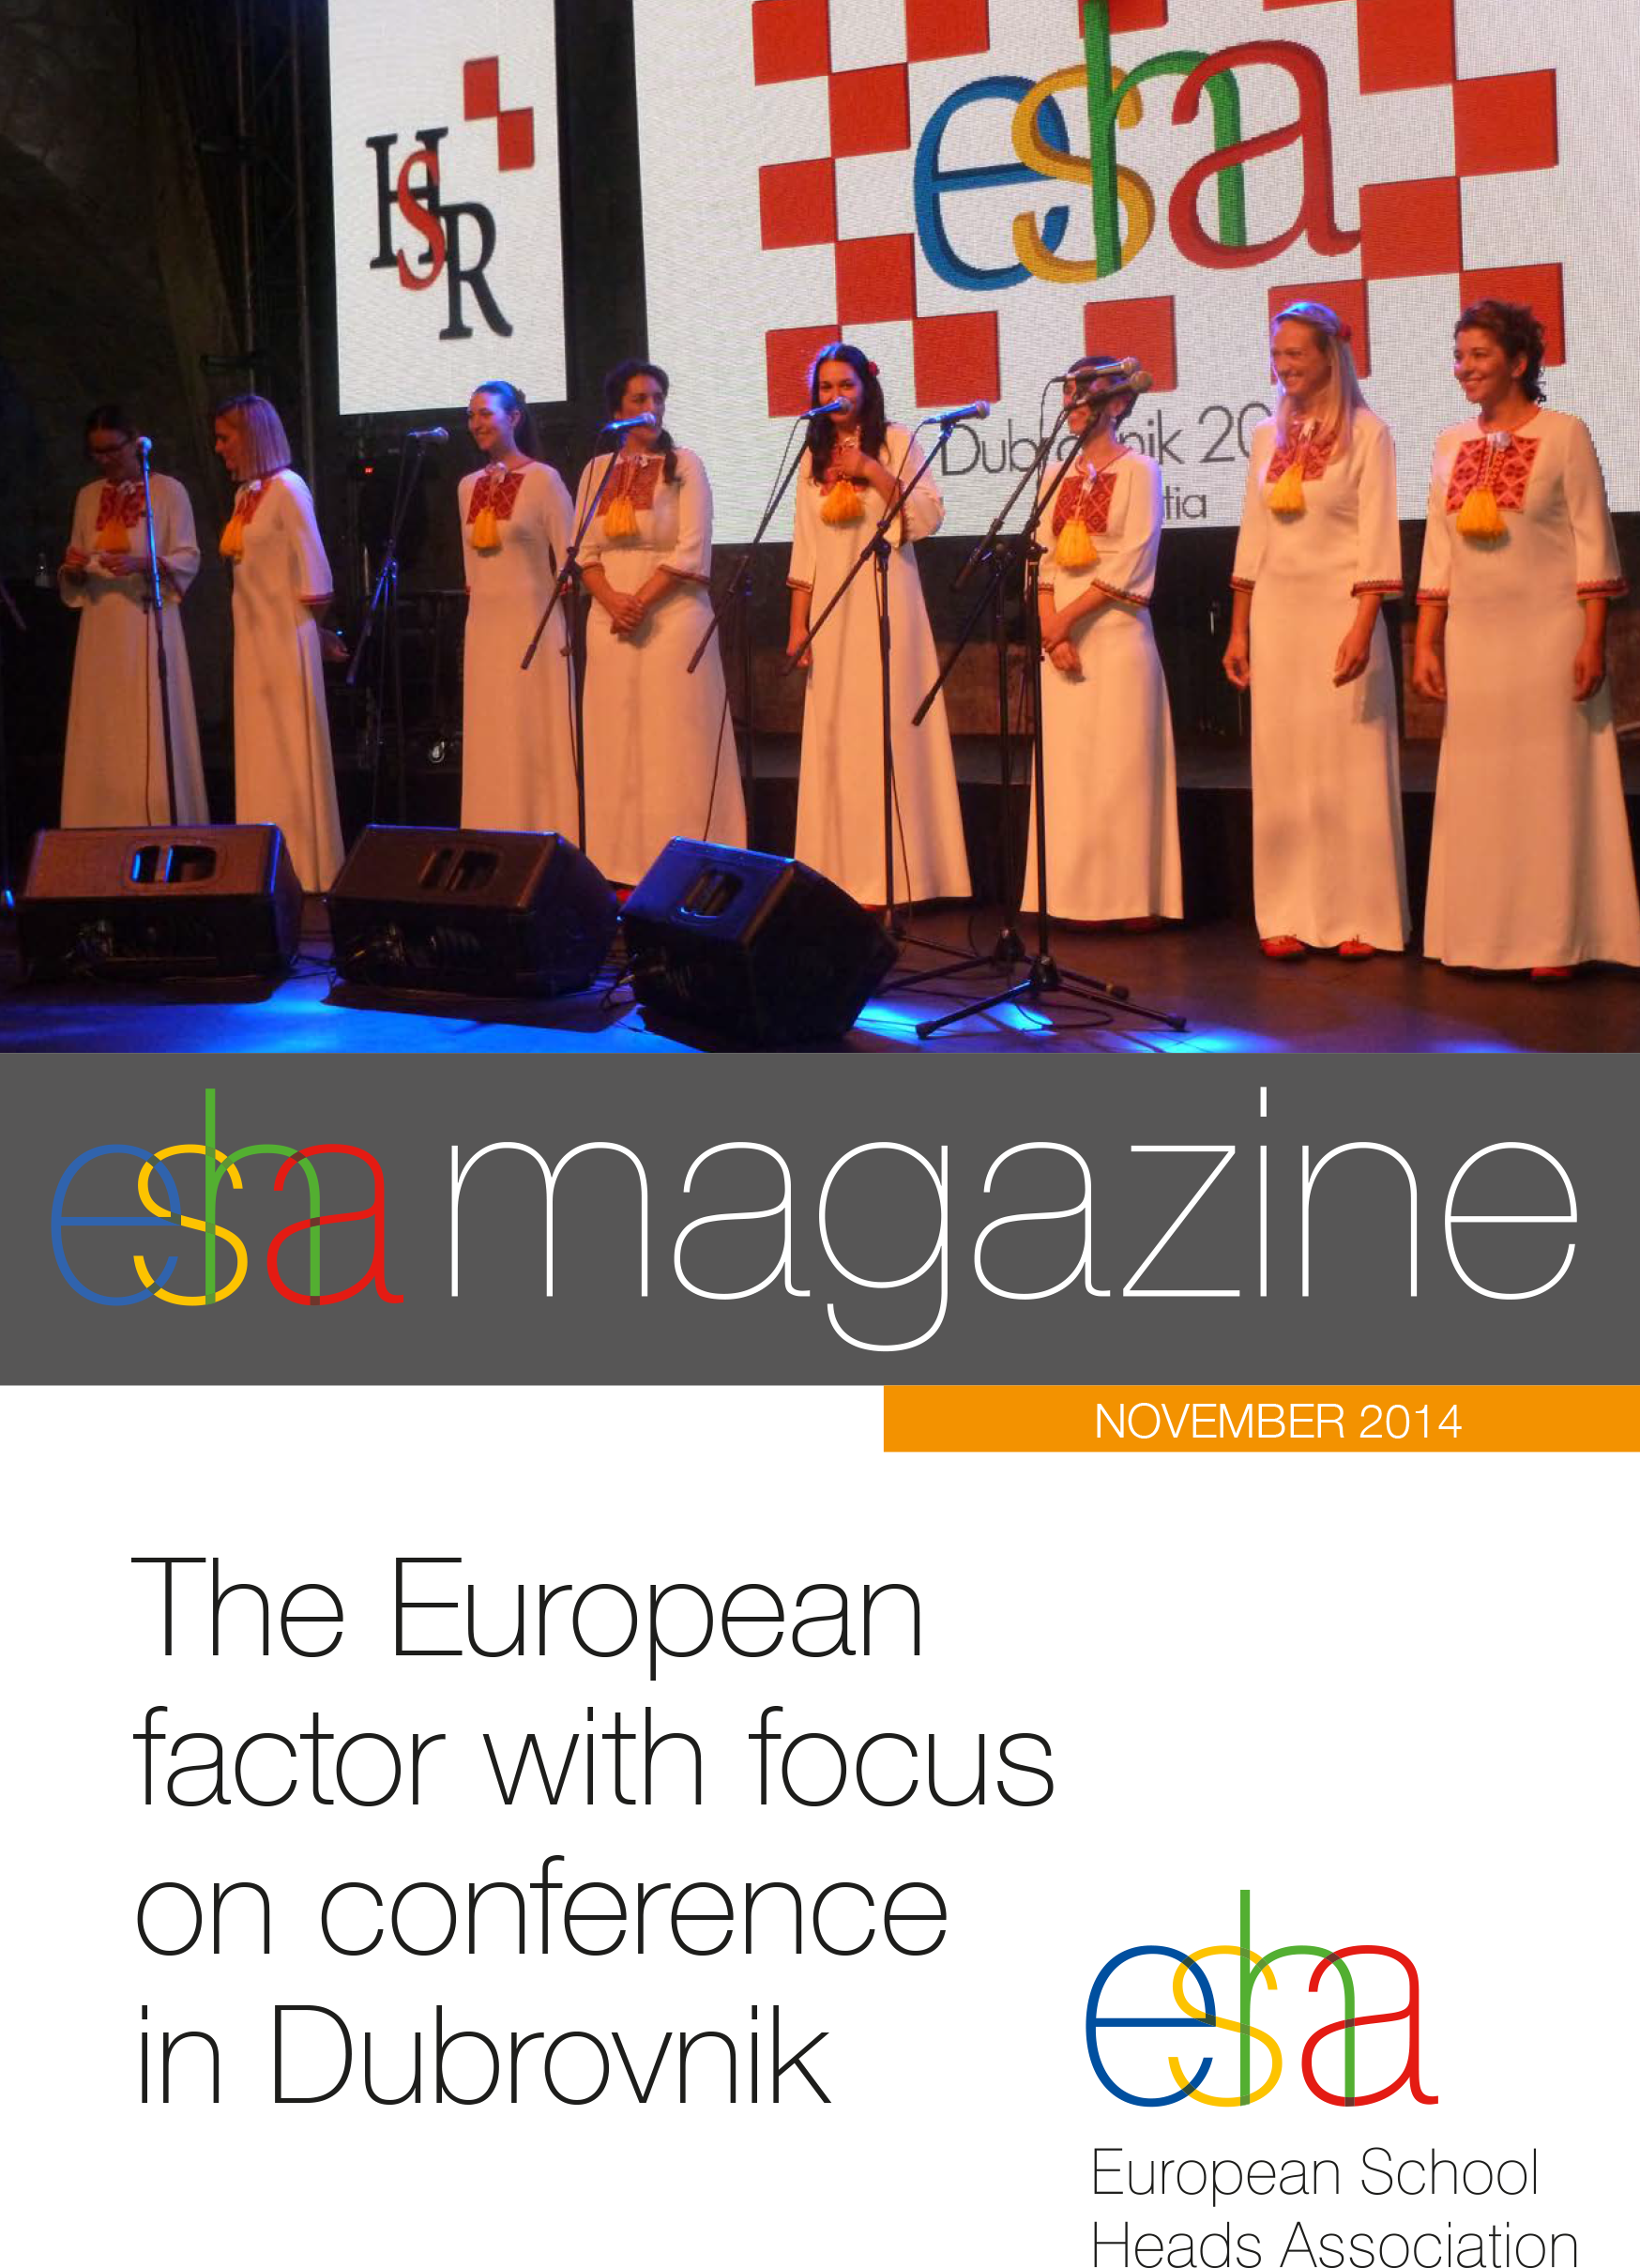 esha-magazine-november-2014-b-1-kopieren